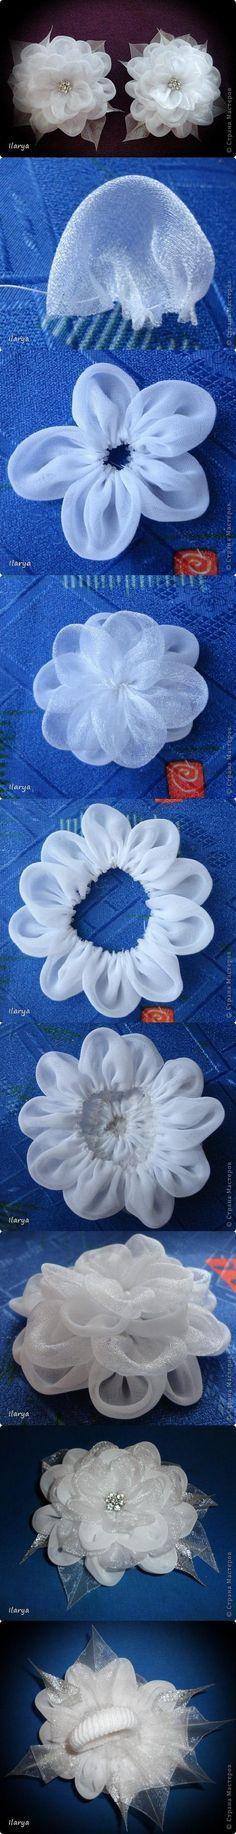 Flor c/ fita